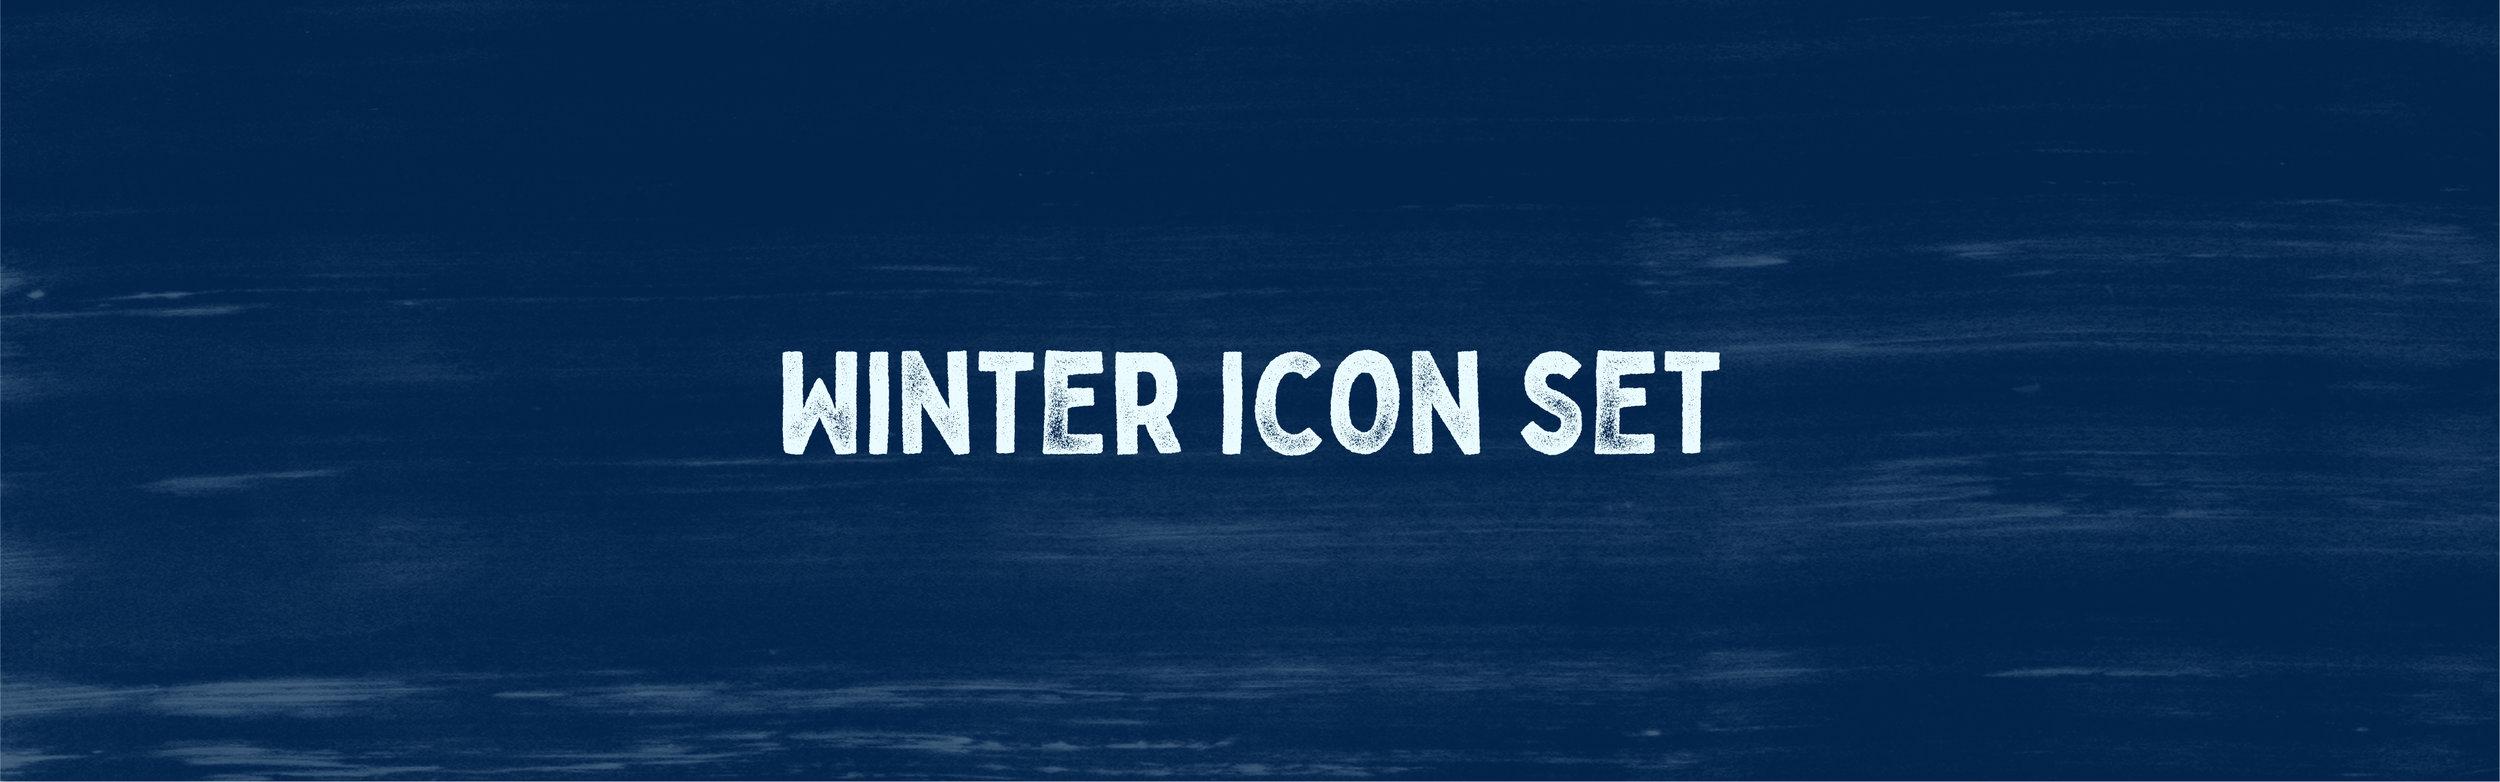 Winter Icon case study-01.jpg